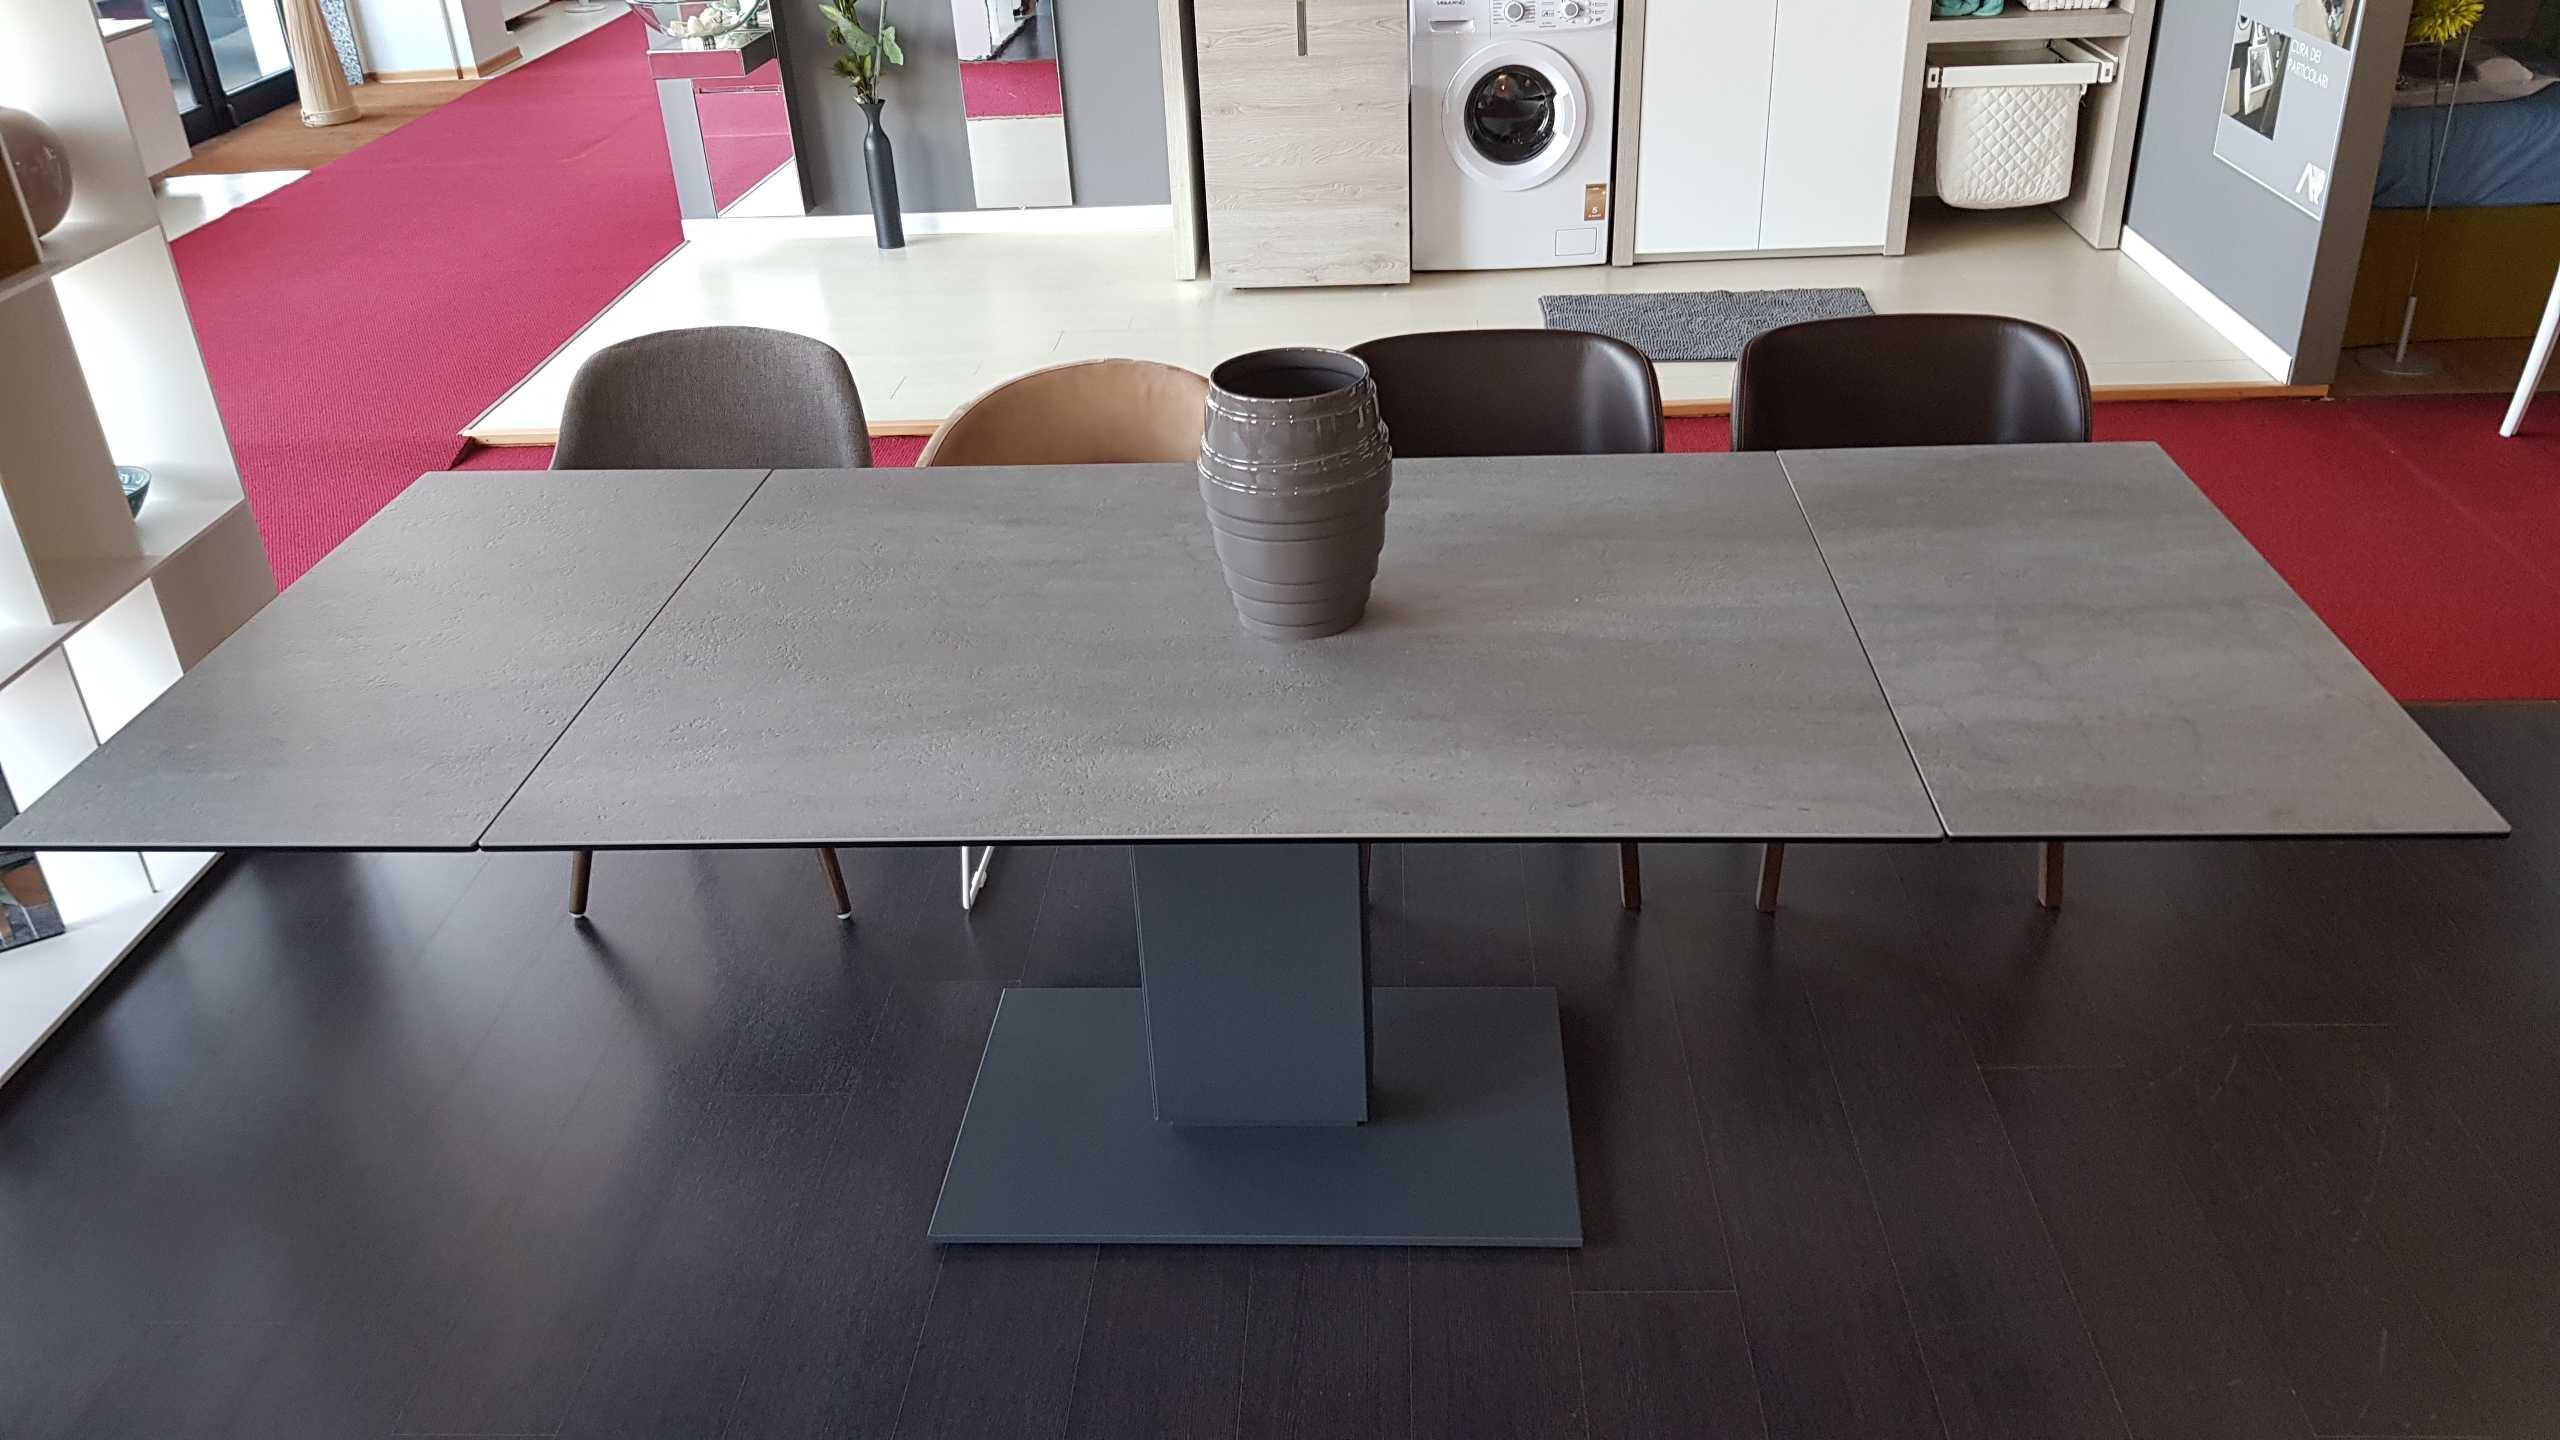 Outlet tavolo calligaris echo in ceramica cemento tavoli for Consolle calligaris offerta